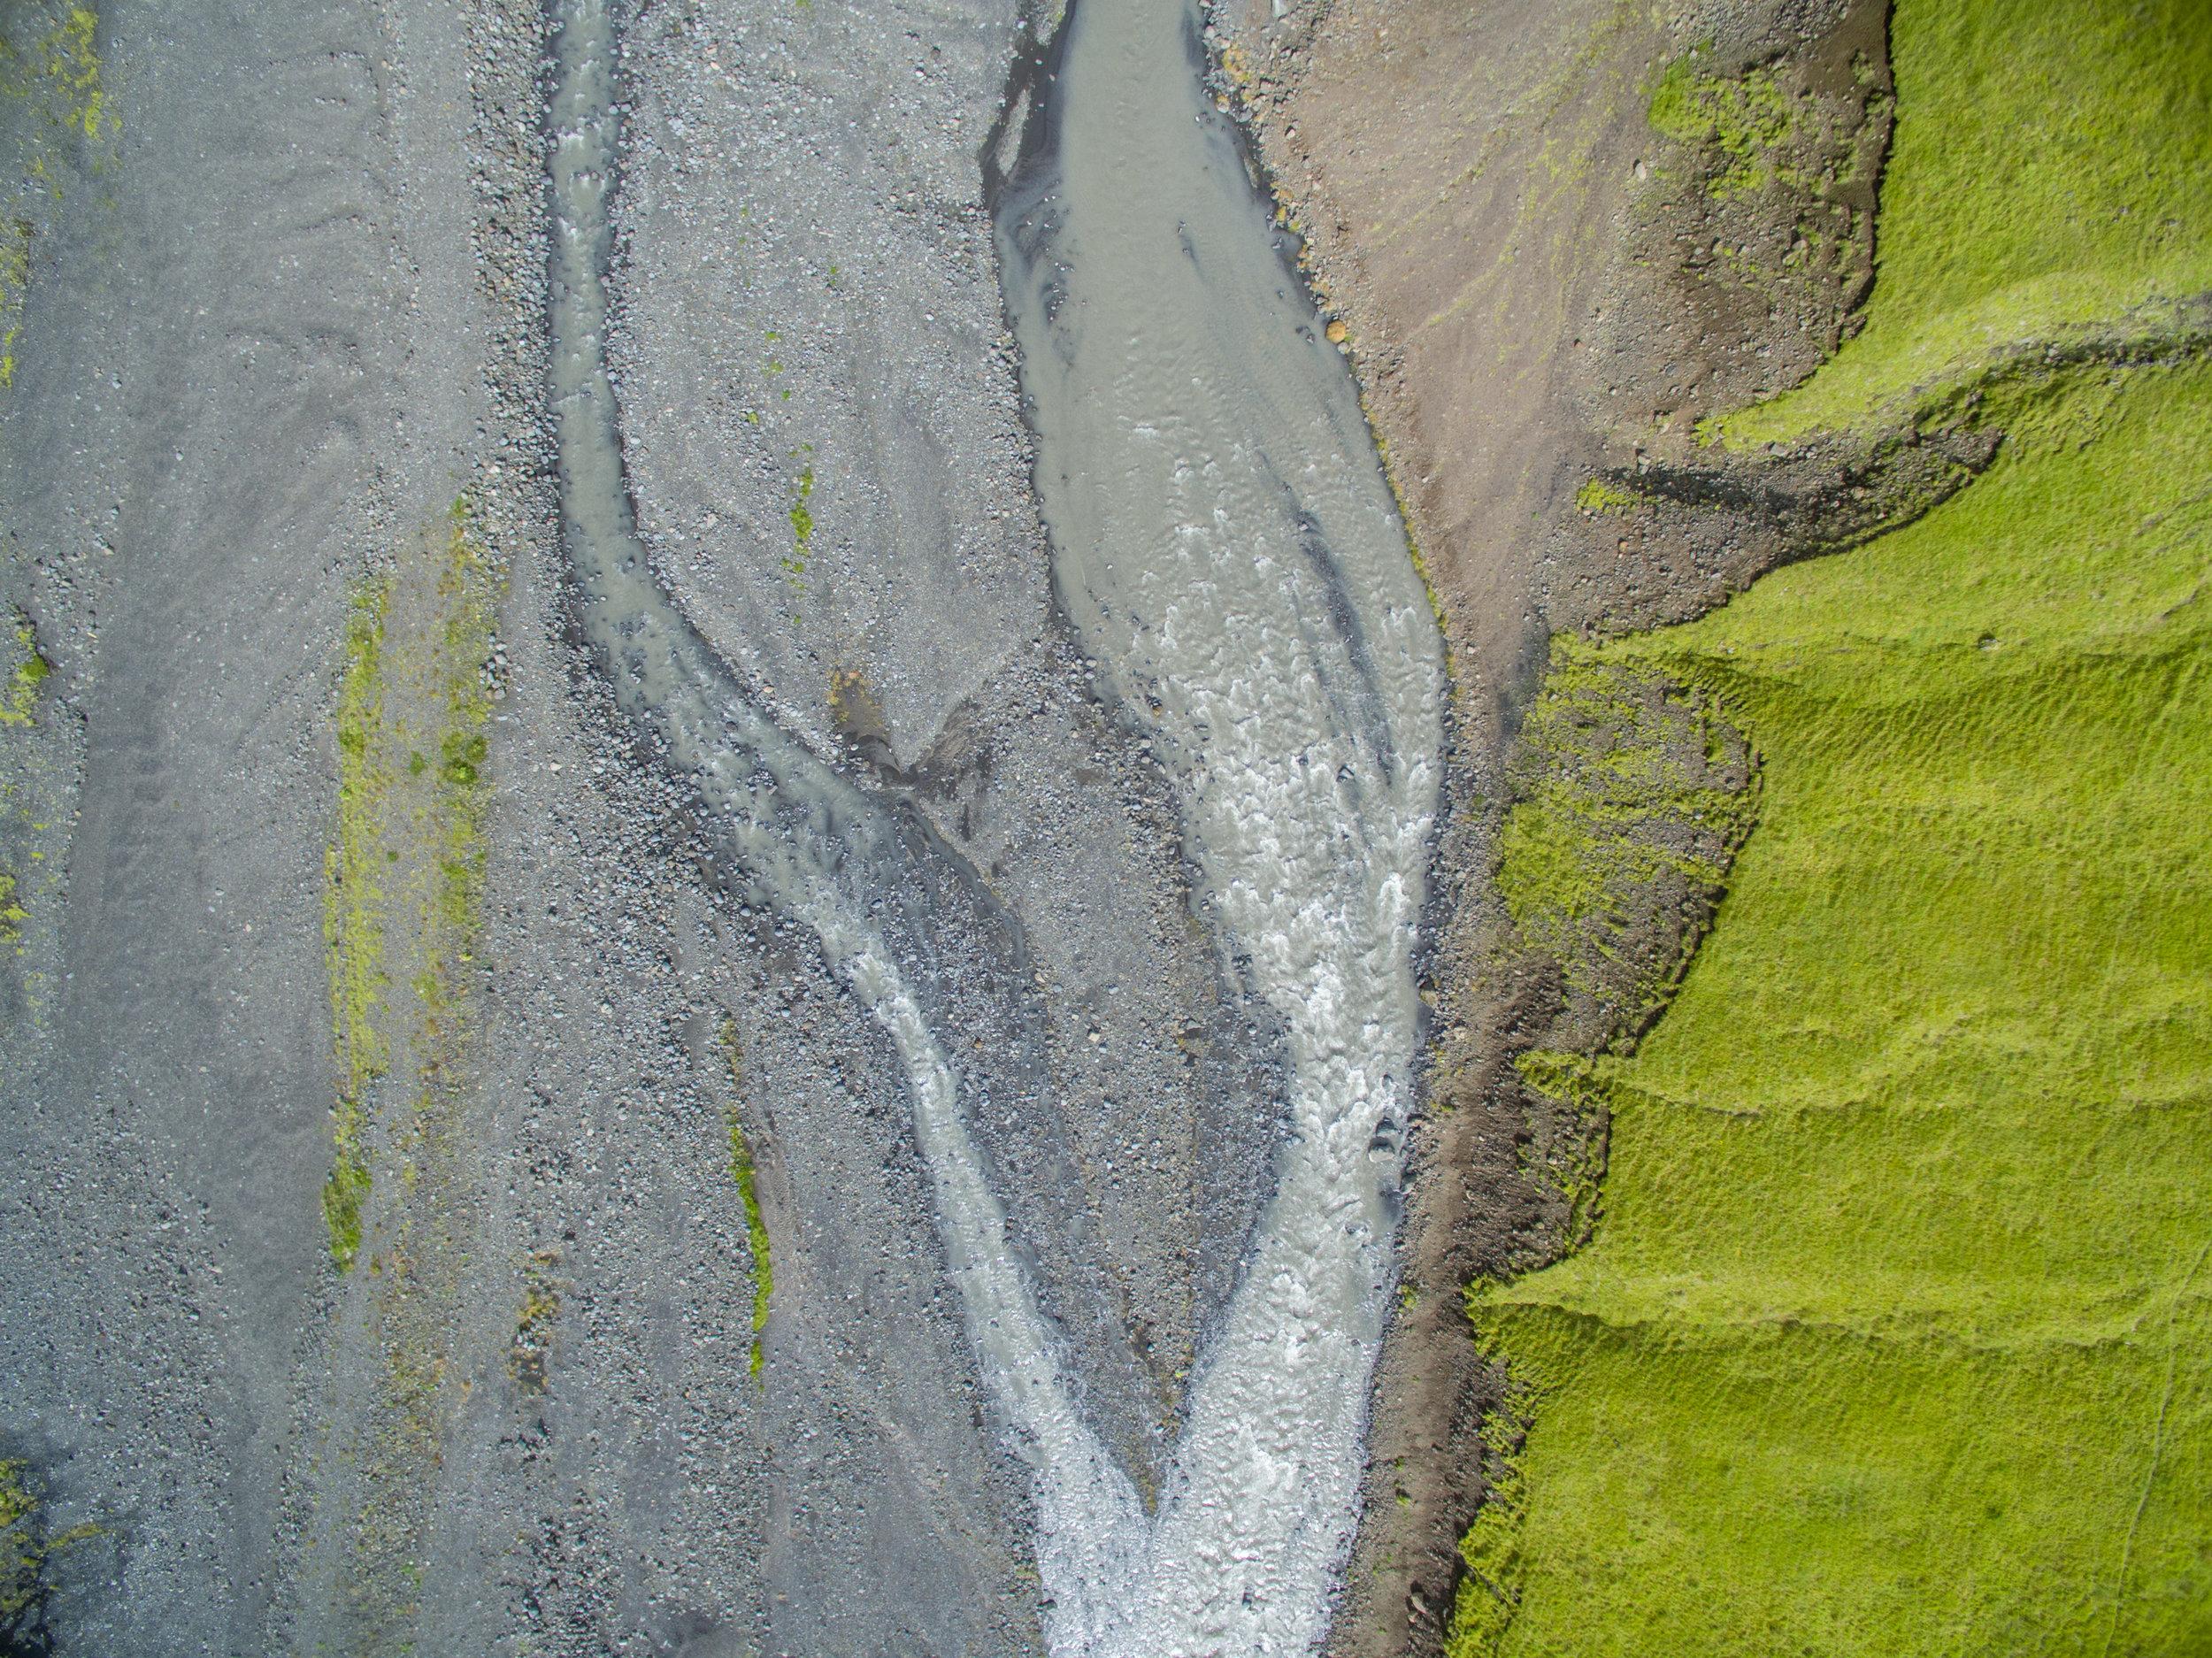 iceland.drone.-6 copy.jpg